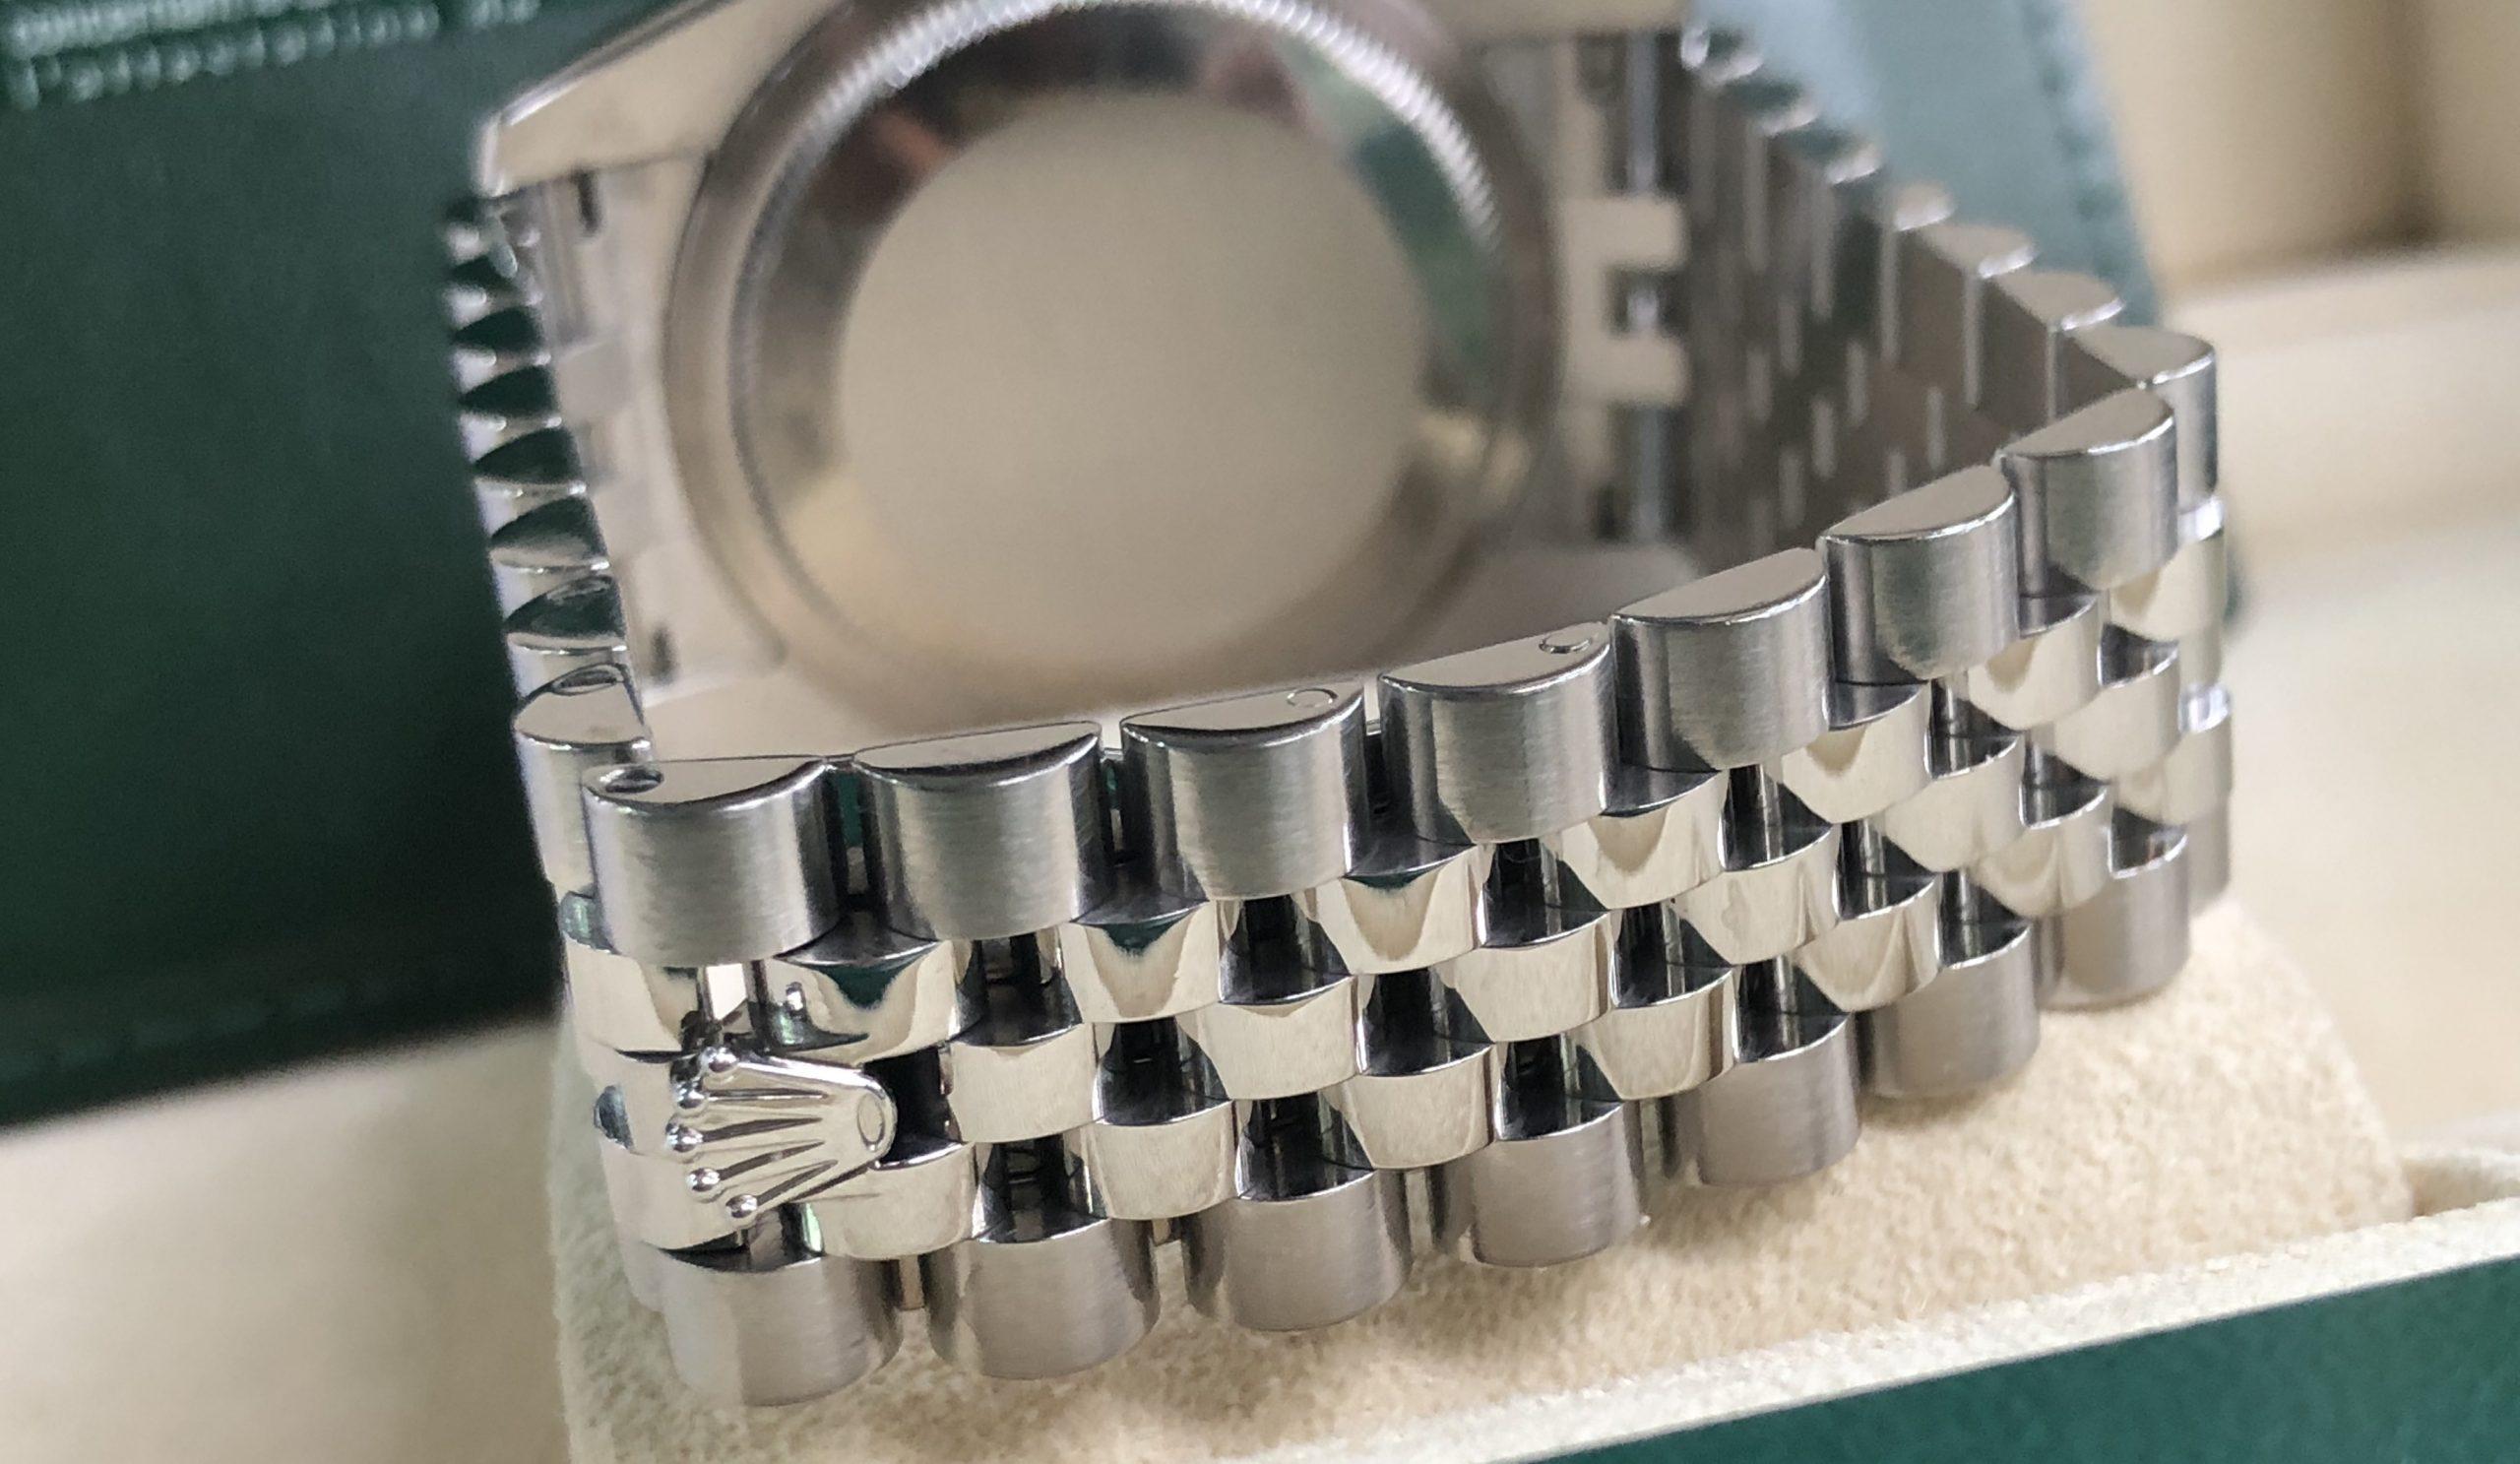 Rolex 116234 mặt ngọc trai fullbox sản xuất năm 2010